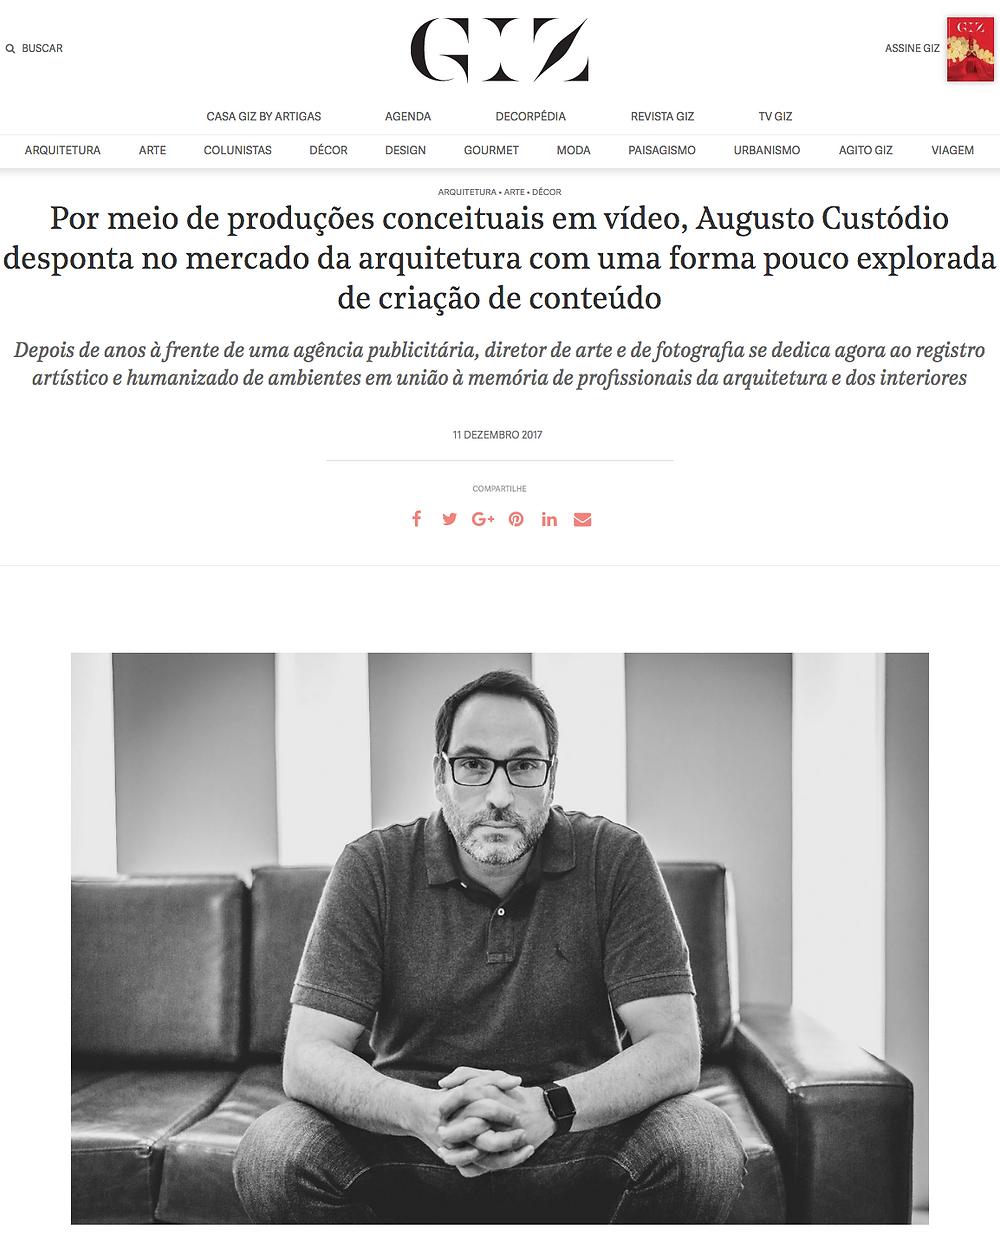 Revista GIZ Augusto Custodio